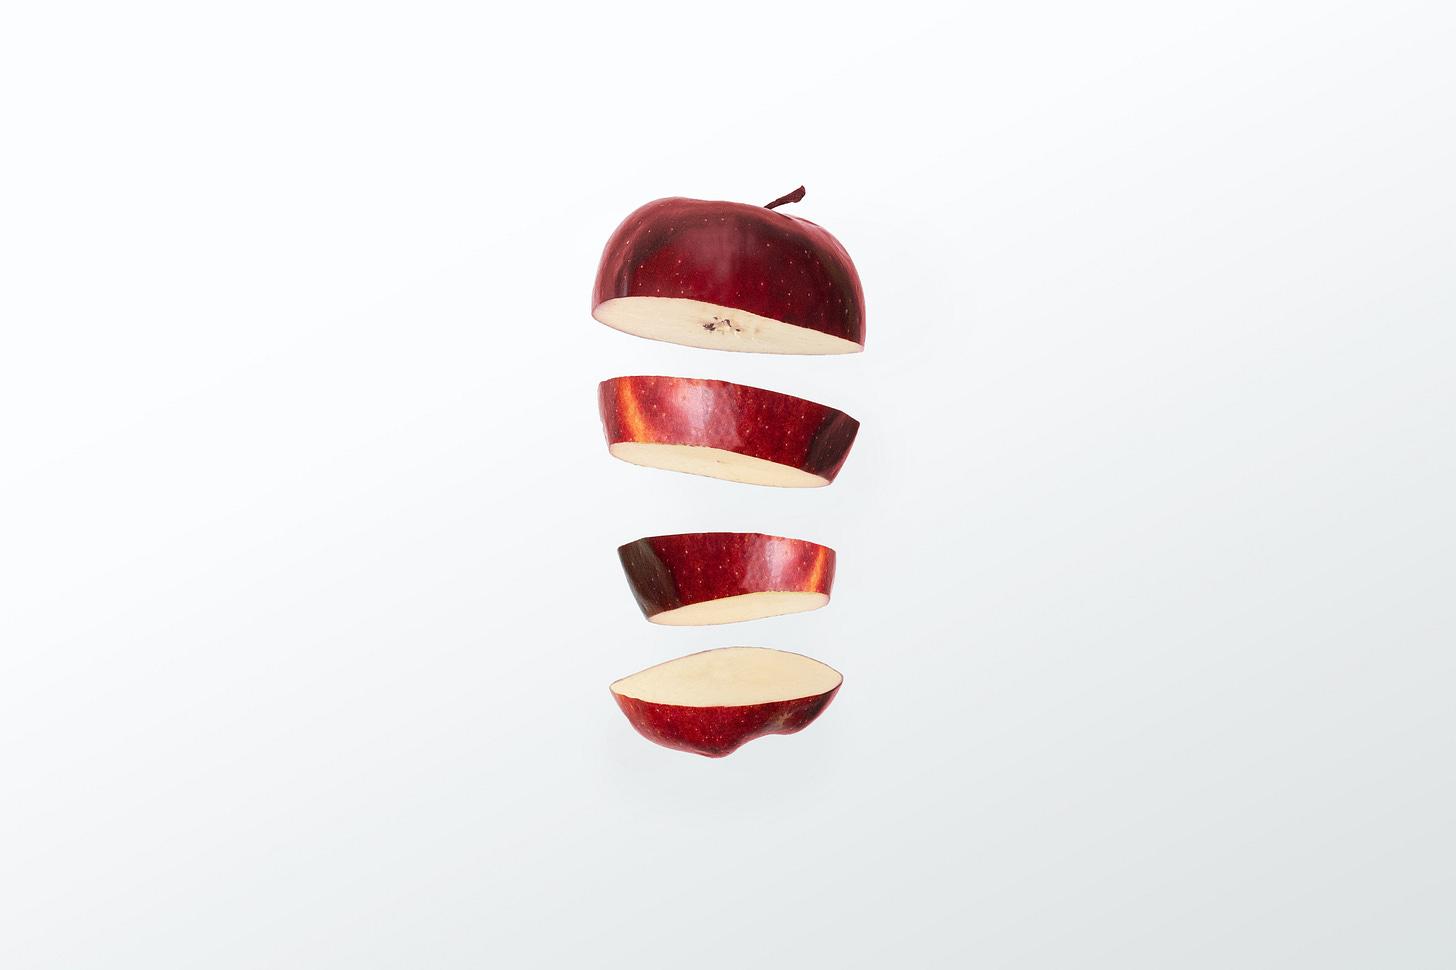 Photo of an Apple in slices. By Nikolai Chernichenko / Unsplash